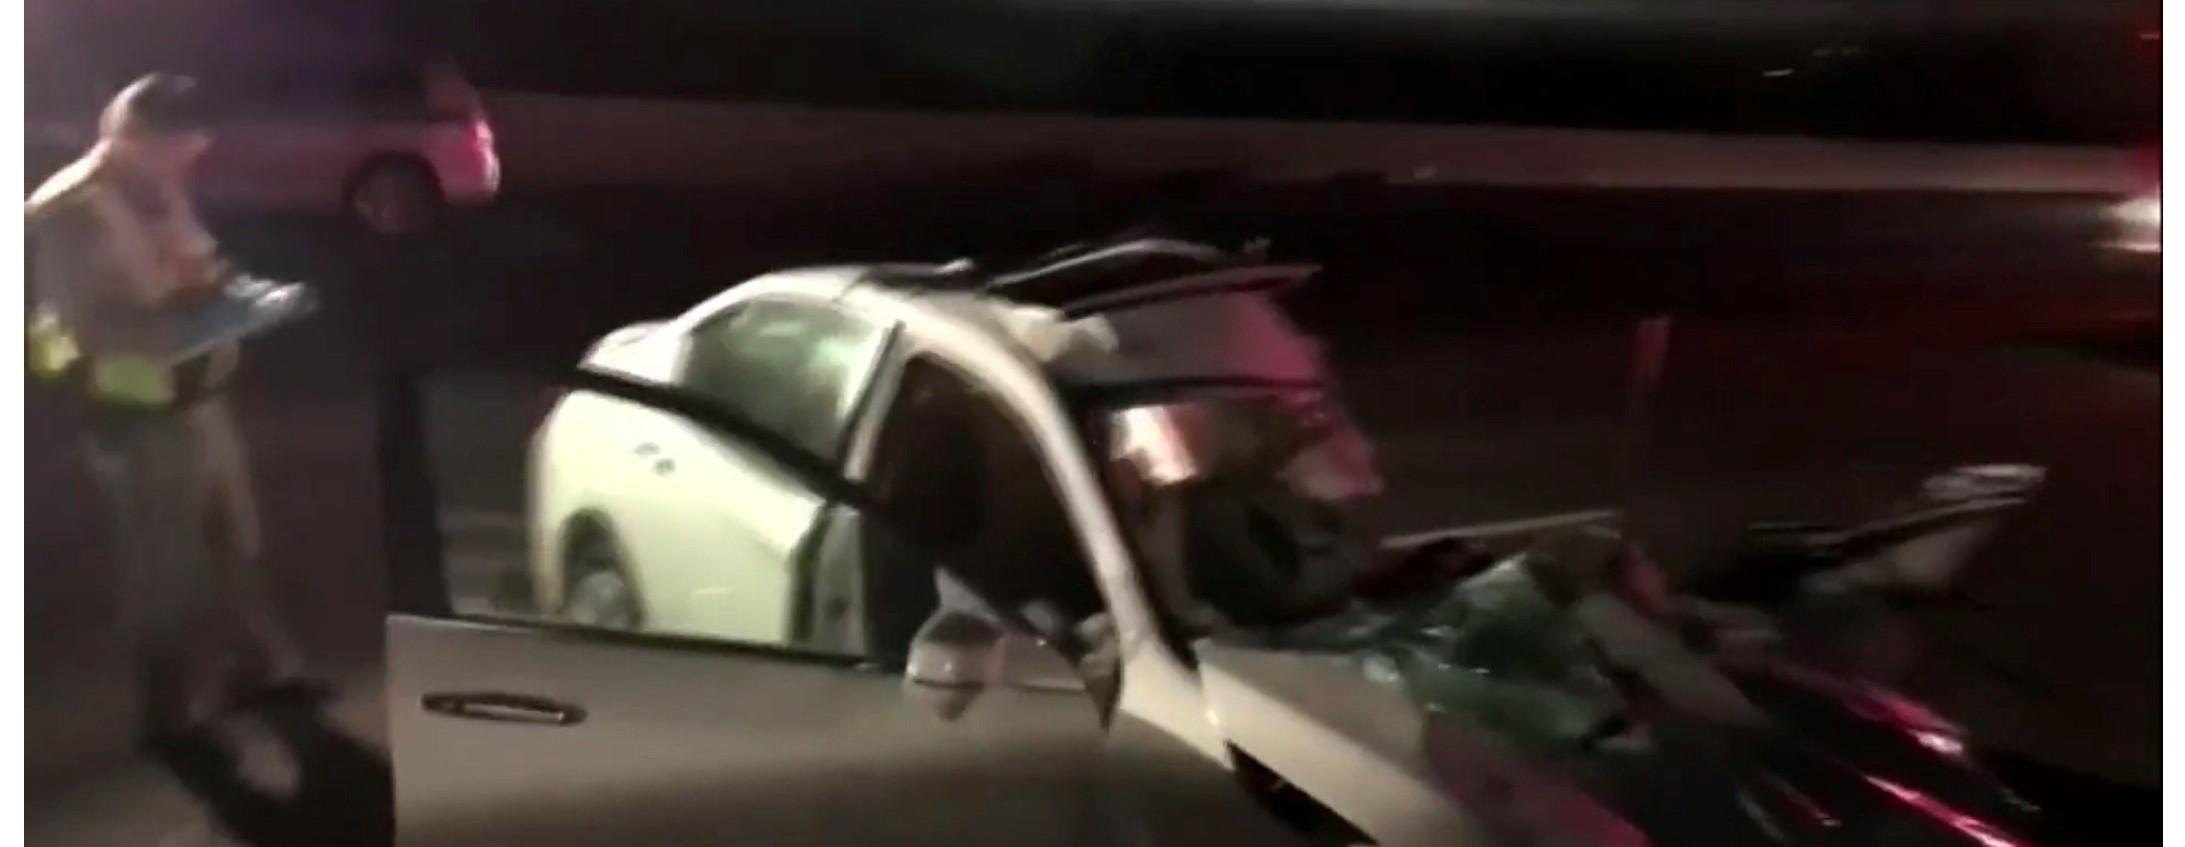 Accident On 80 Sacramento Today